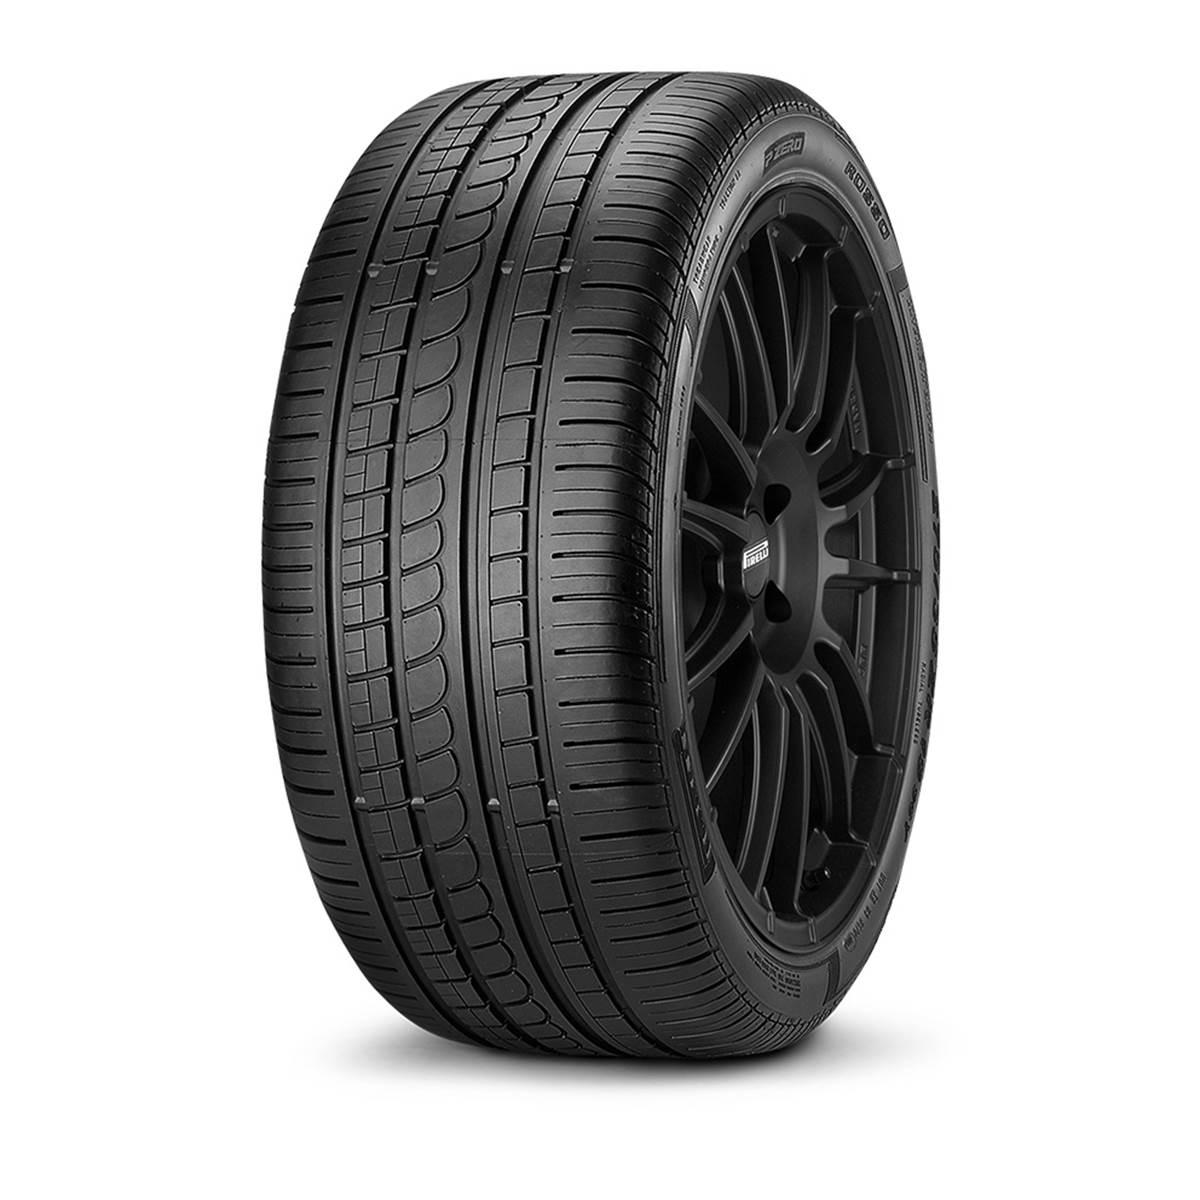 Pneu Pirelli 215/50R17 95Y Pzero Nero (Gt) XL